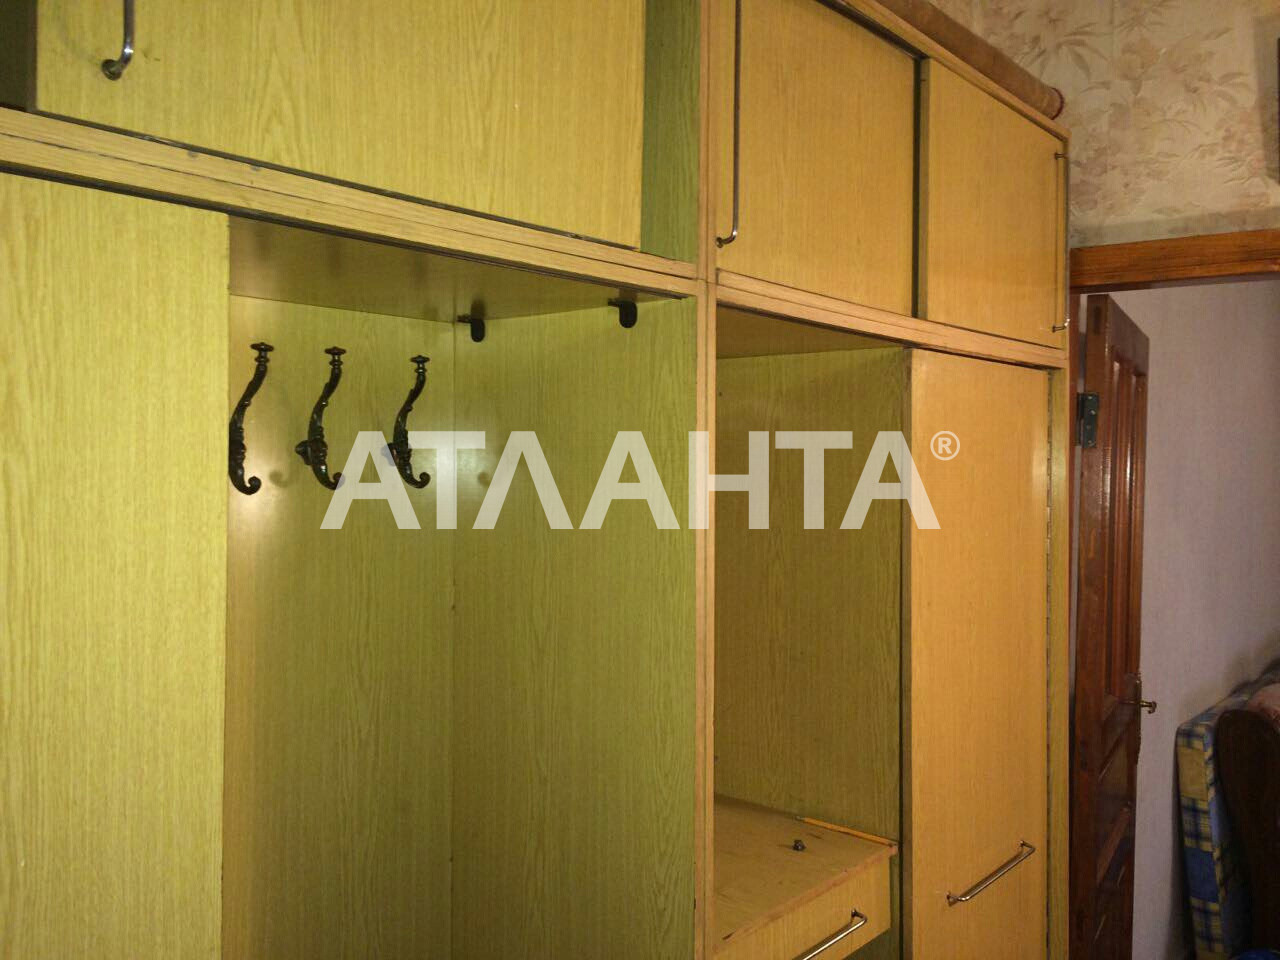 Продается 3-комнатная Квартира на ул. Люстдорфская Дор. 27 — 42 000 у.е. (фото №7)